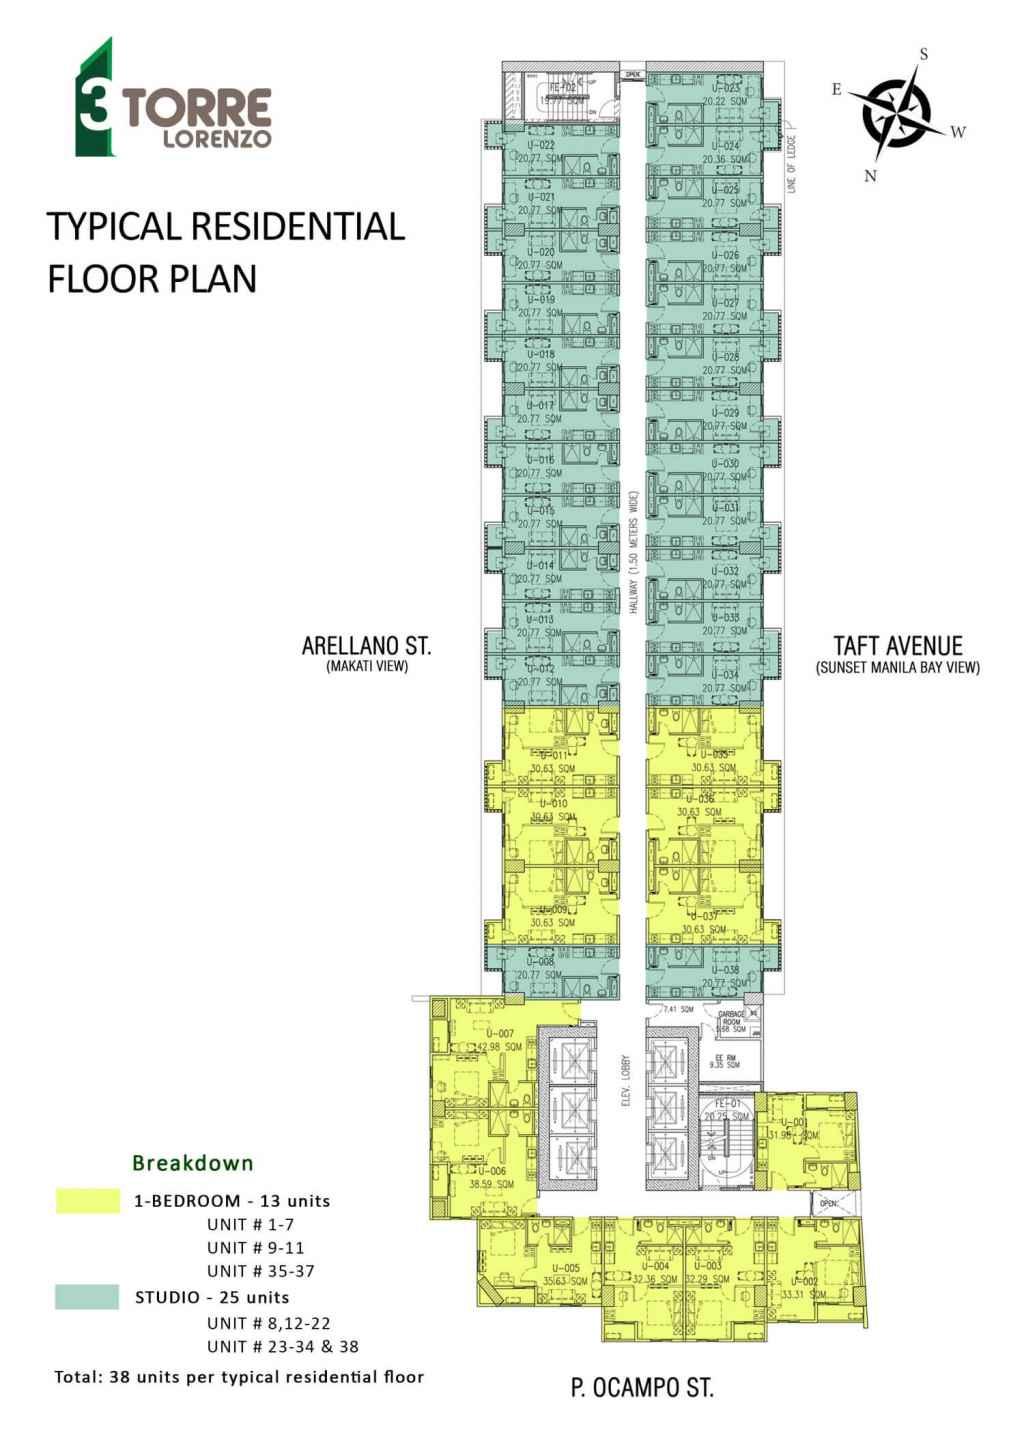 3Torre Lorenzo Typical Floor Plan